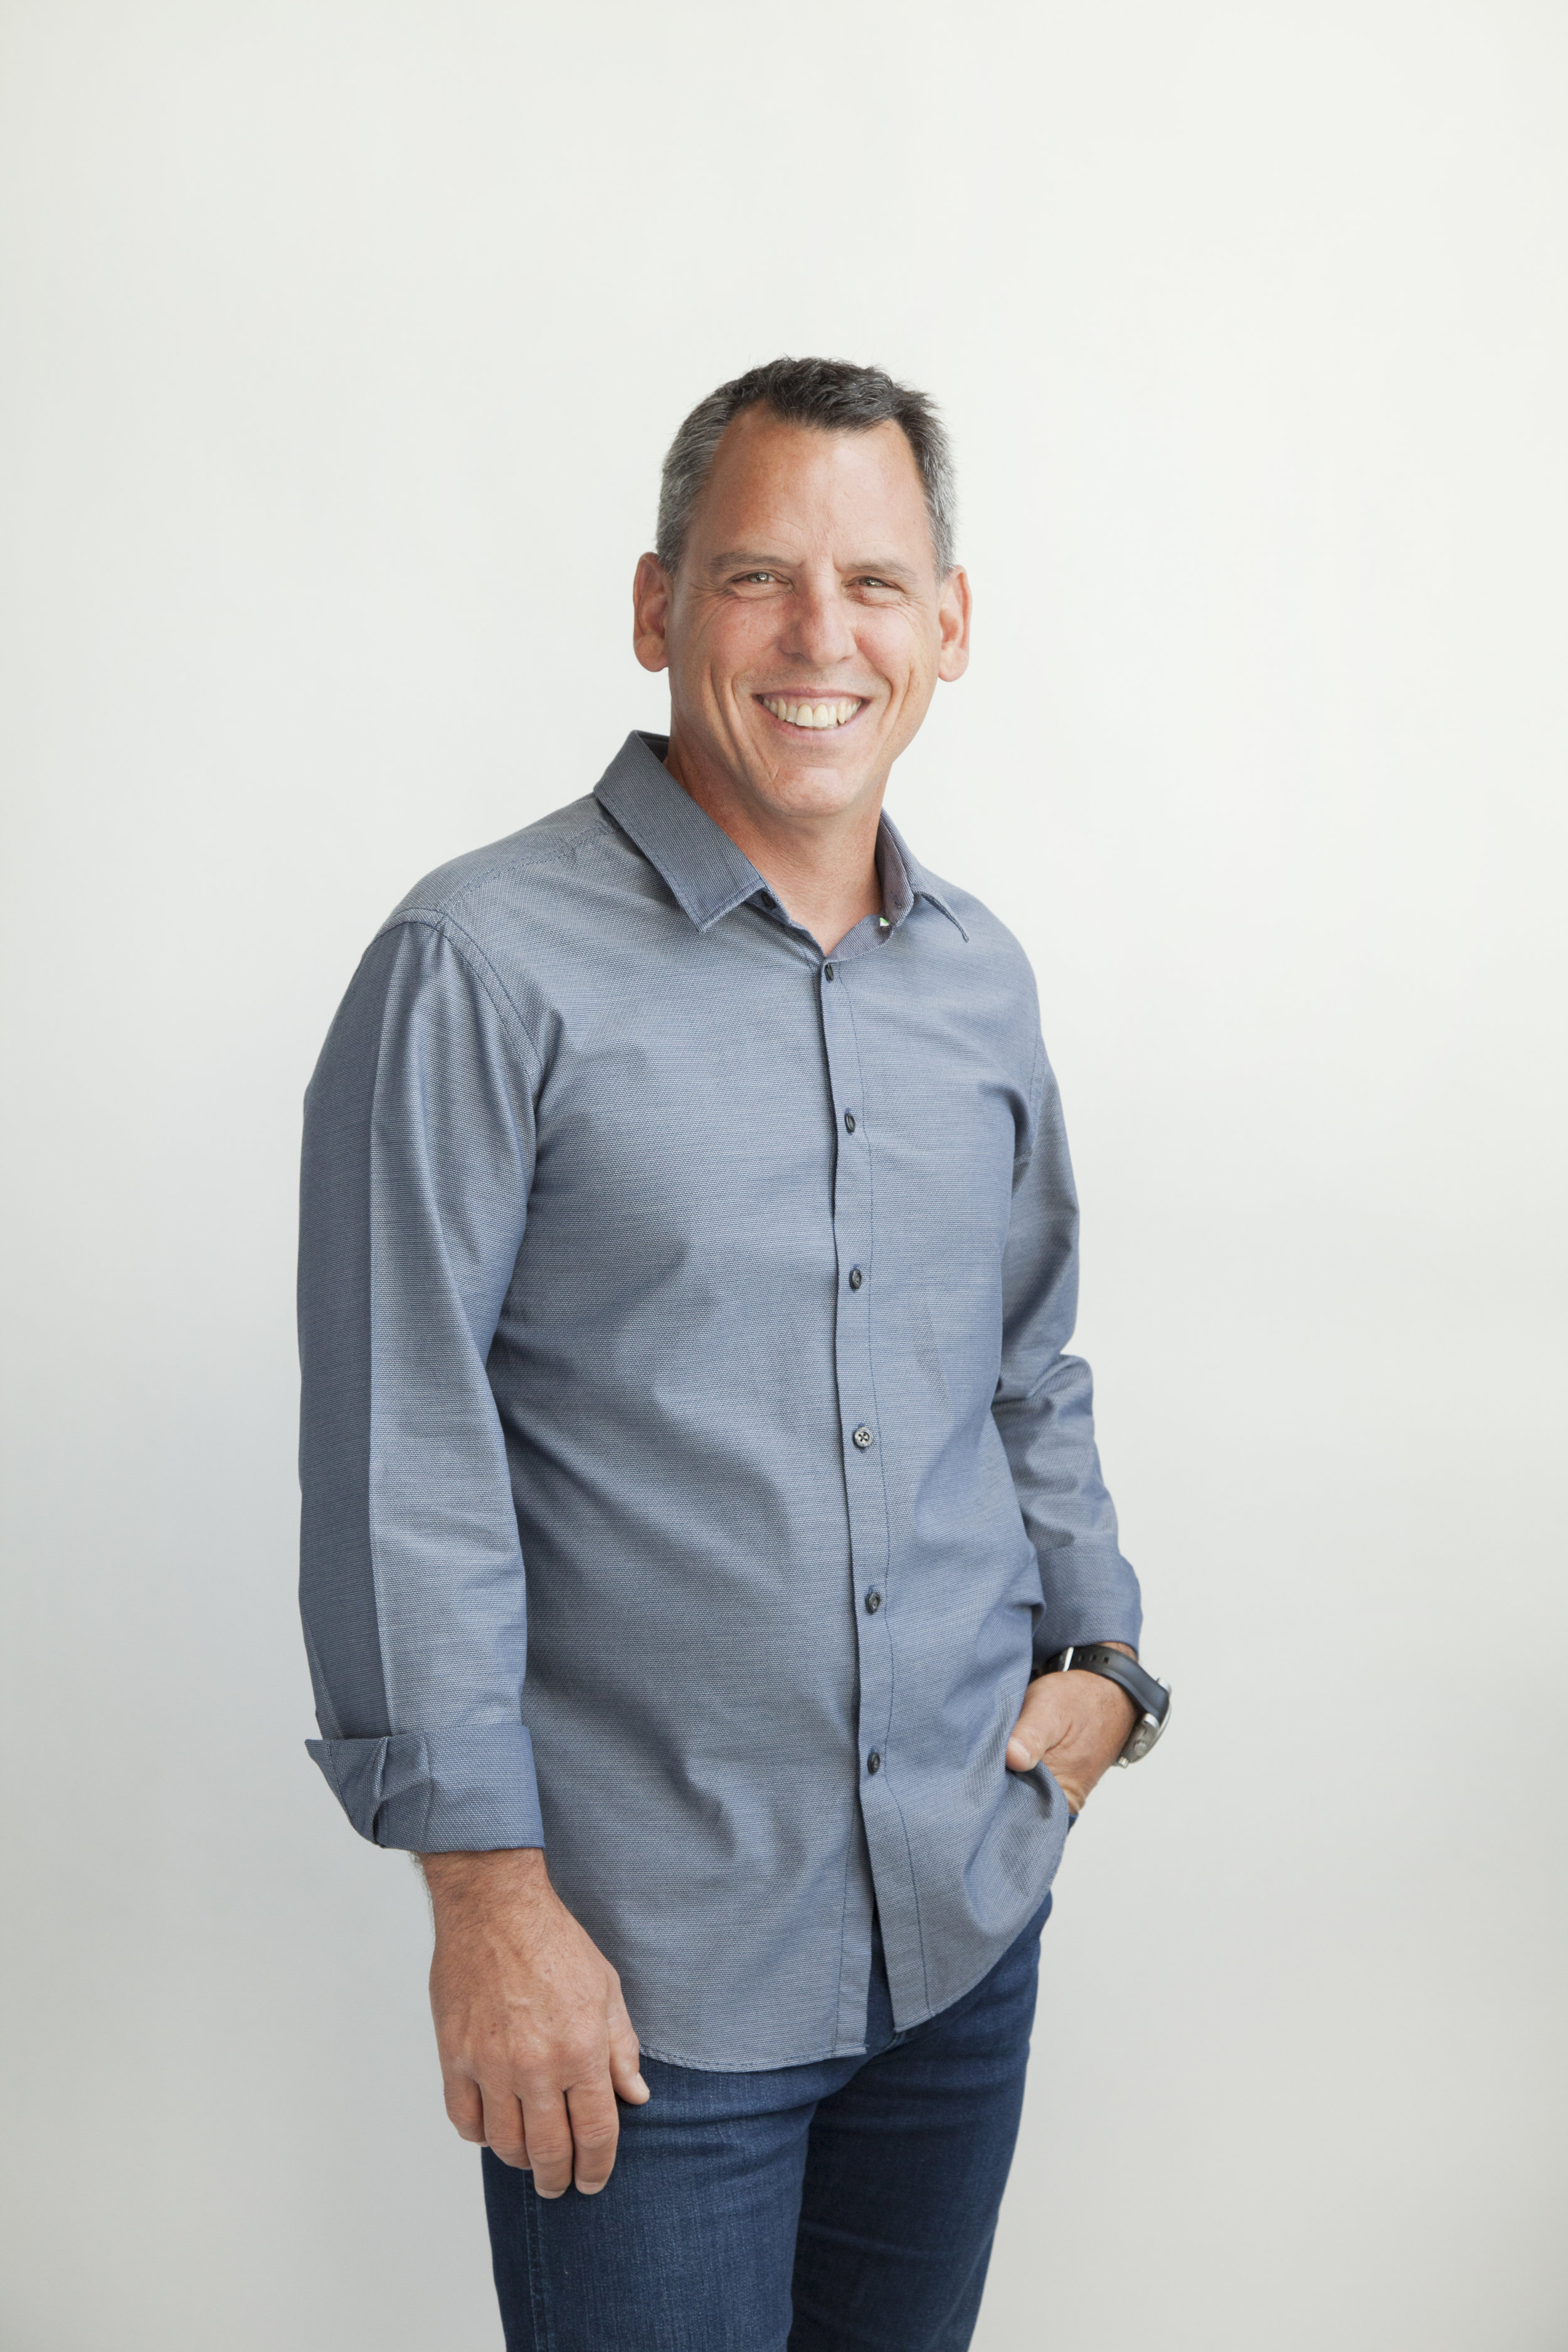 Co-founder Don Chisholm